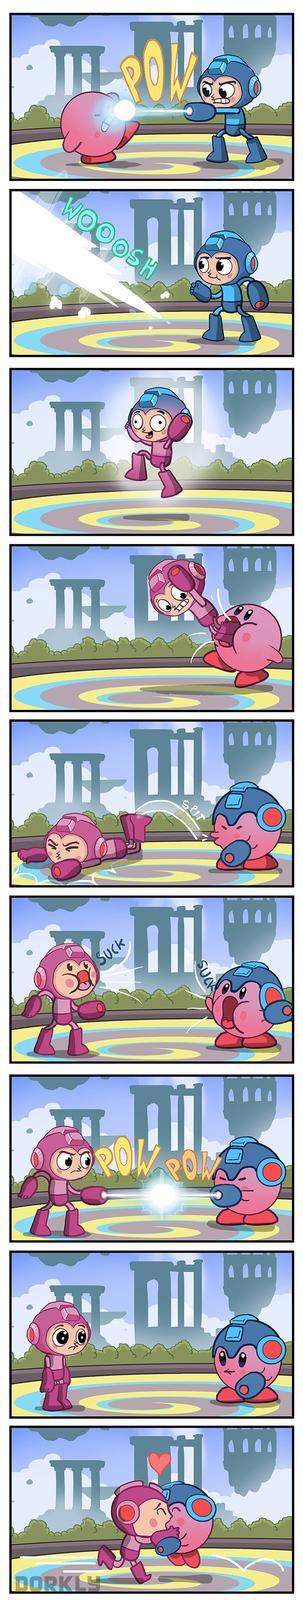 Mega Man Joins Brawl